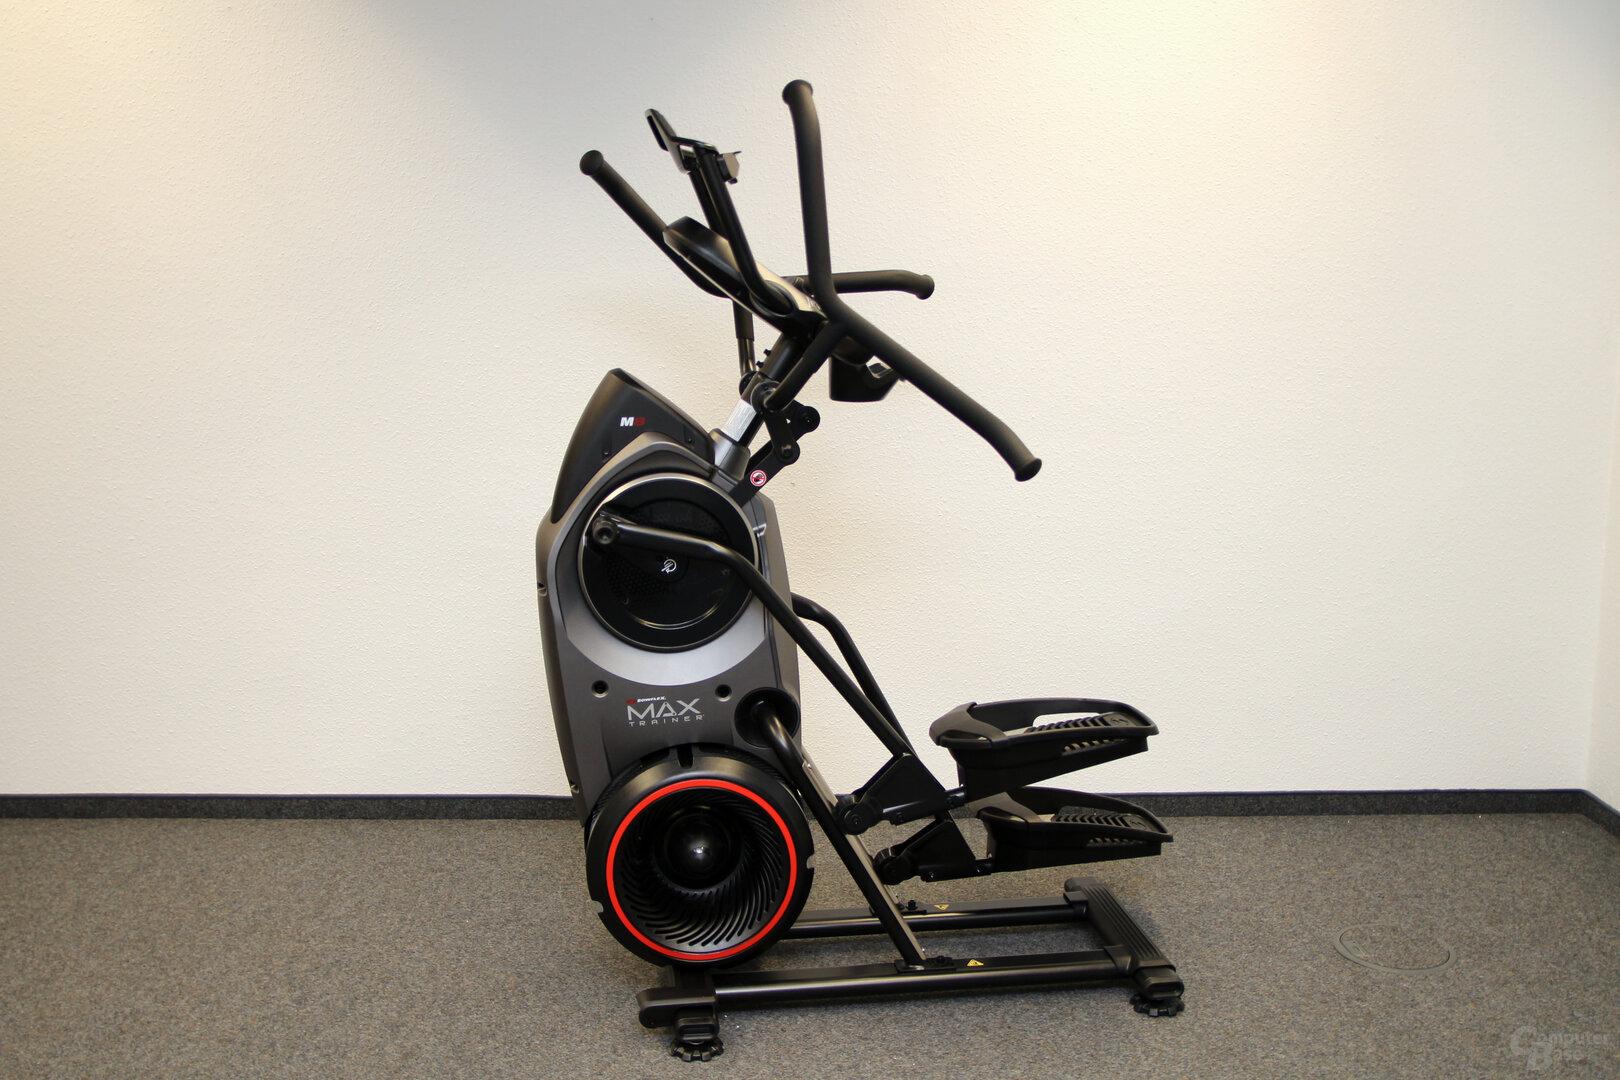 Bowflex Max Trainer M8